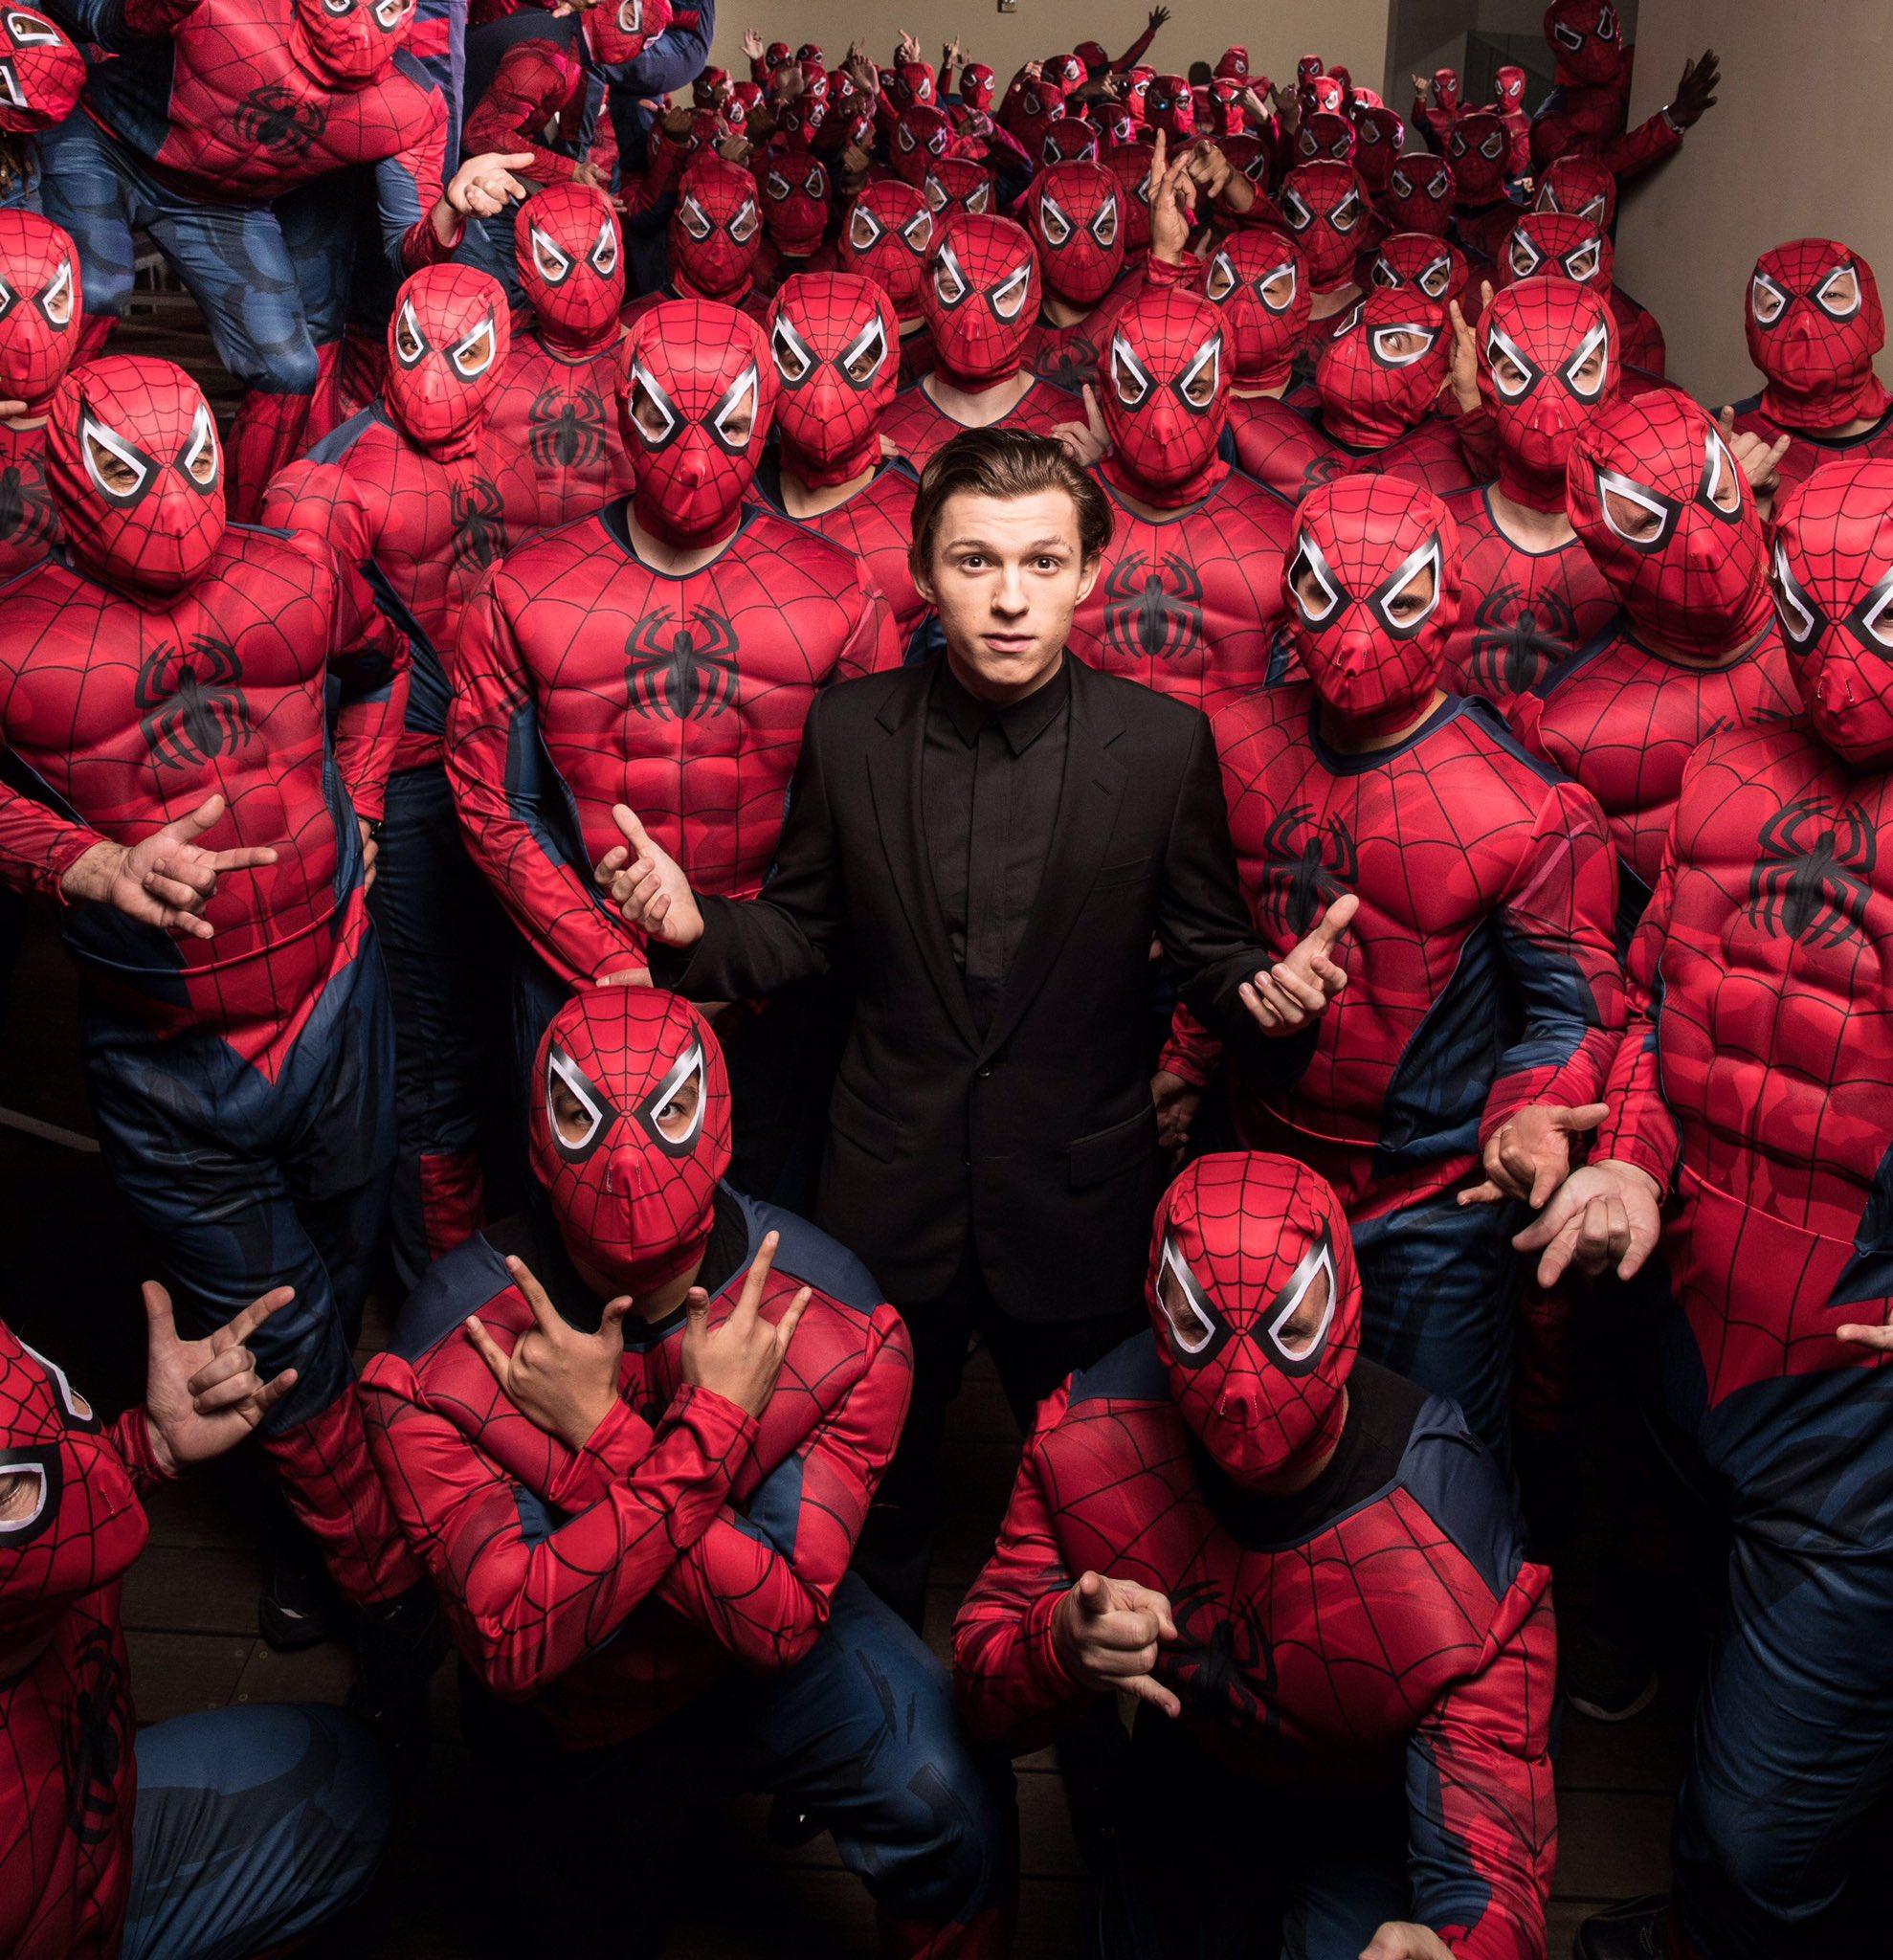 Happy #SpiderManDay! https://t.co/eRQlOyk0OS